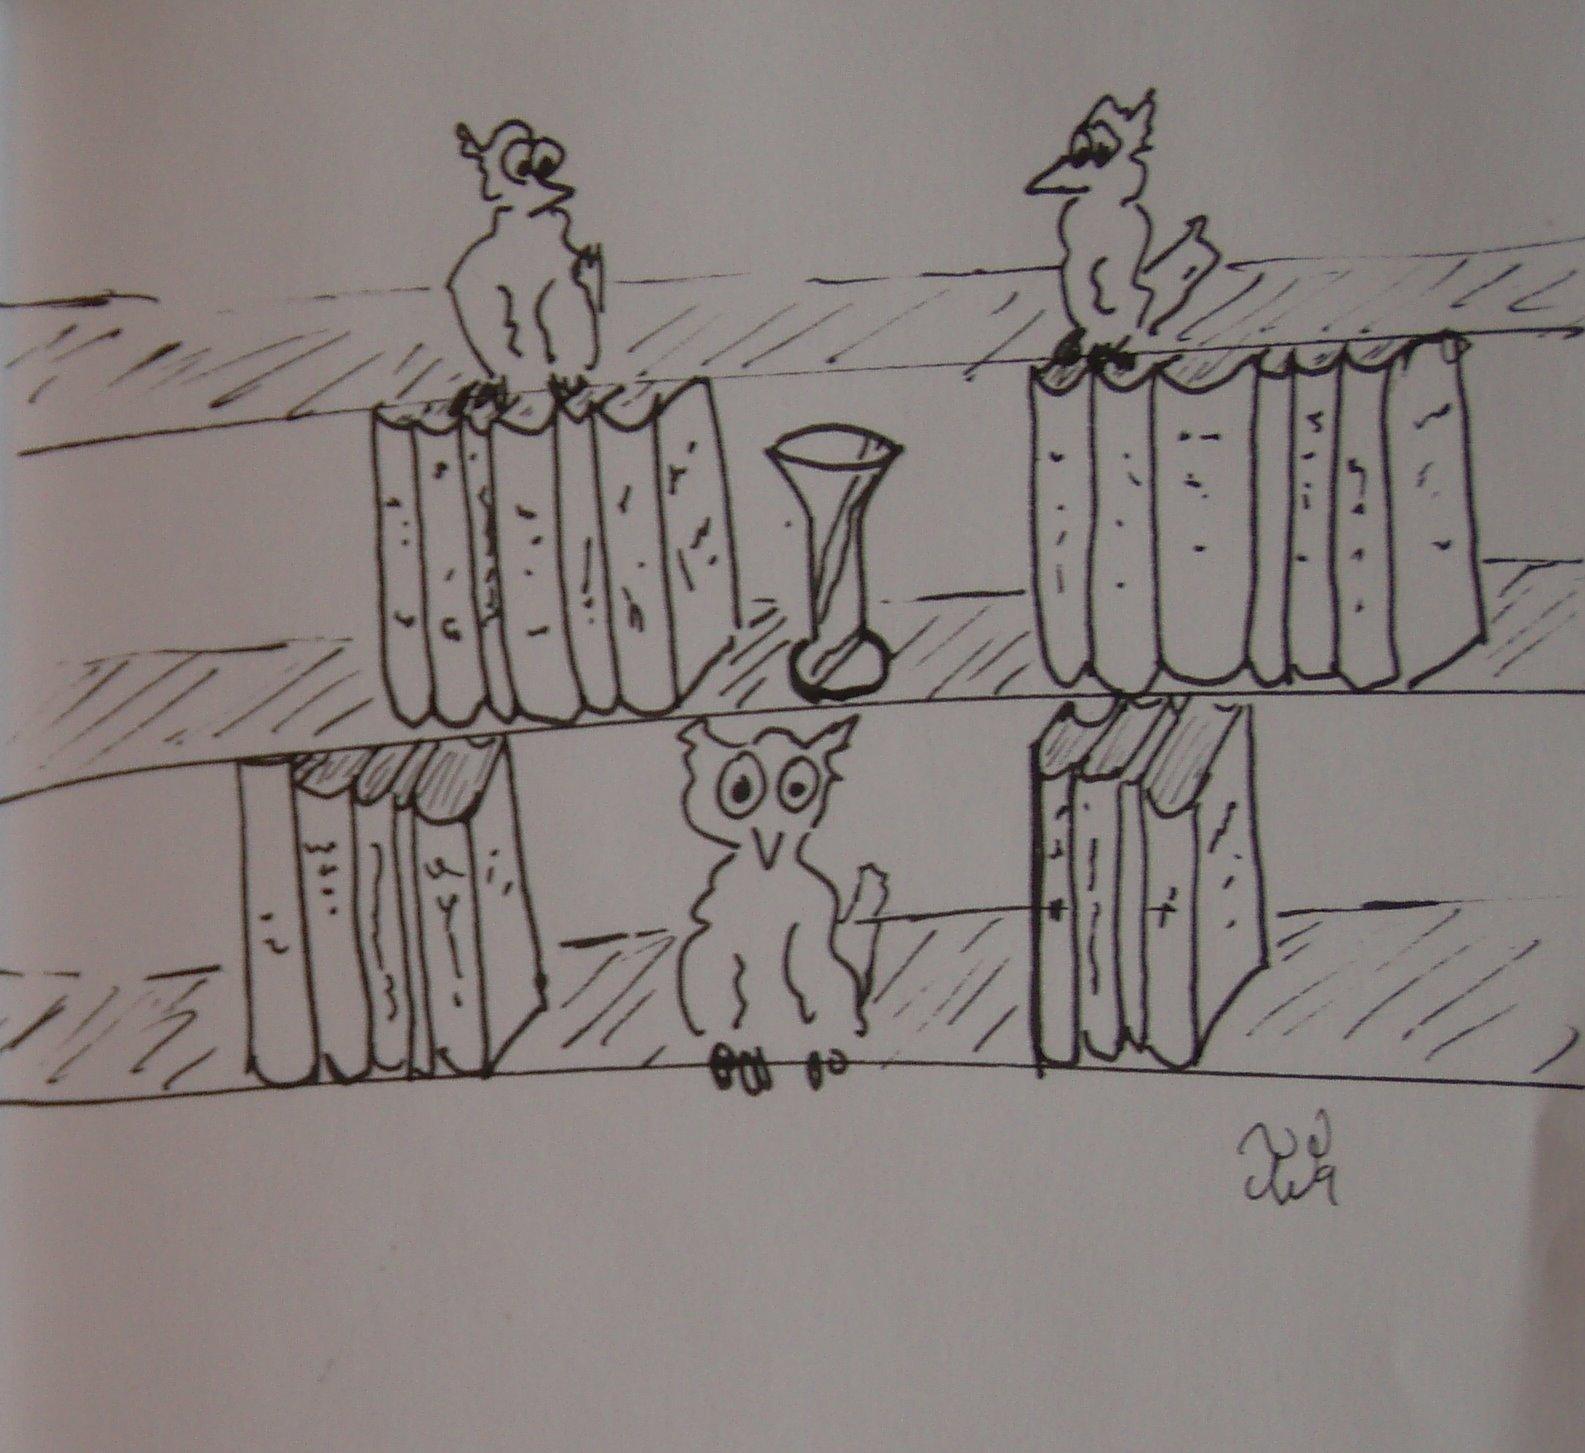 [Owls+in+Library.JPG]